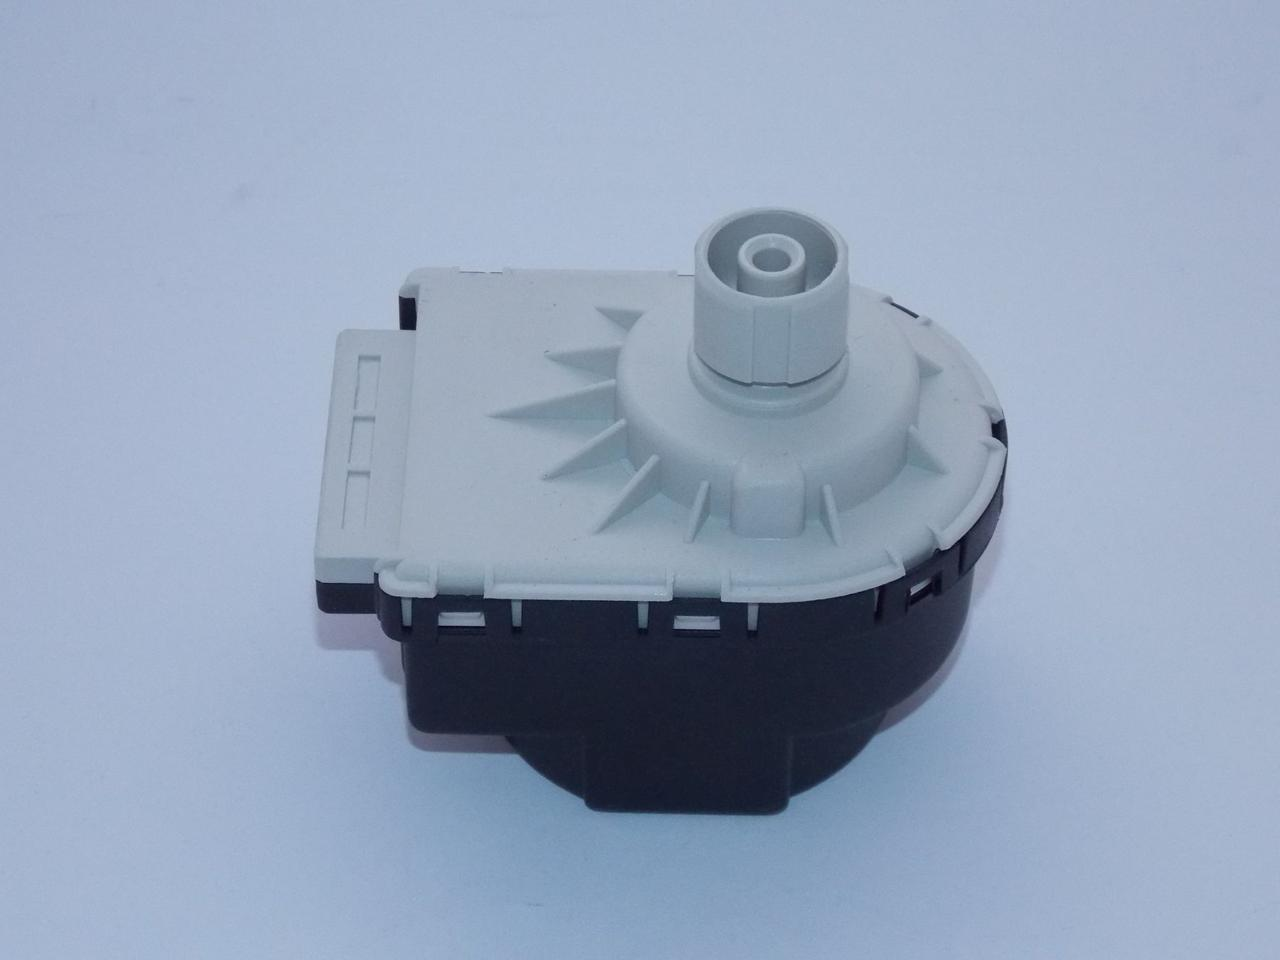 Электропривод (сервомотор) трехходового клапана Ariston 61302483.